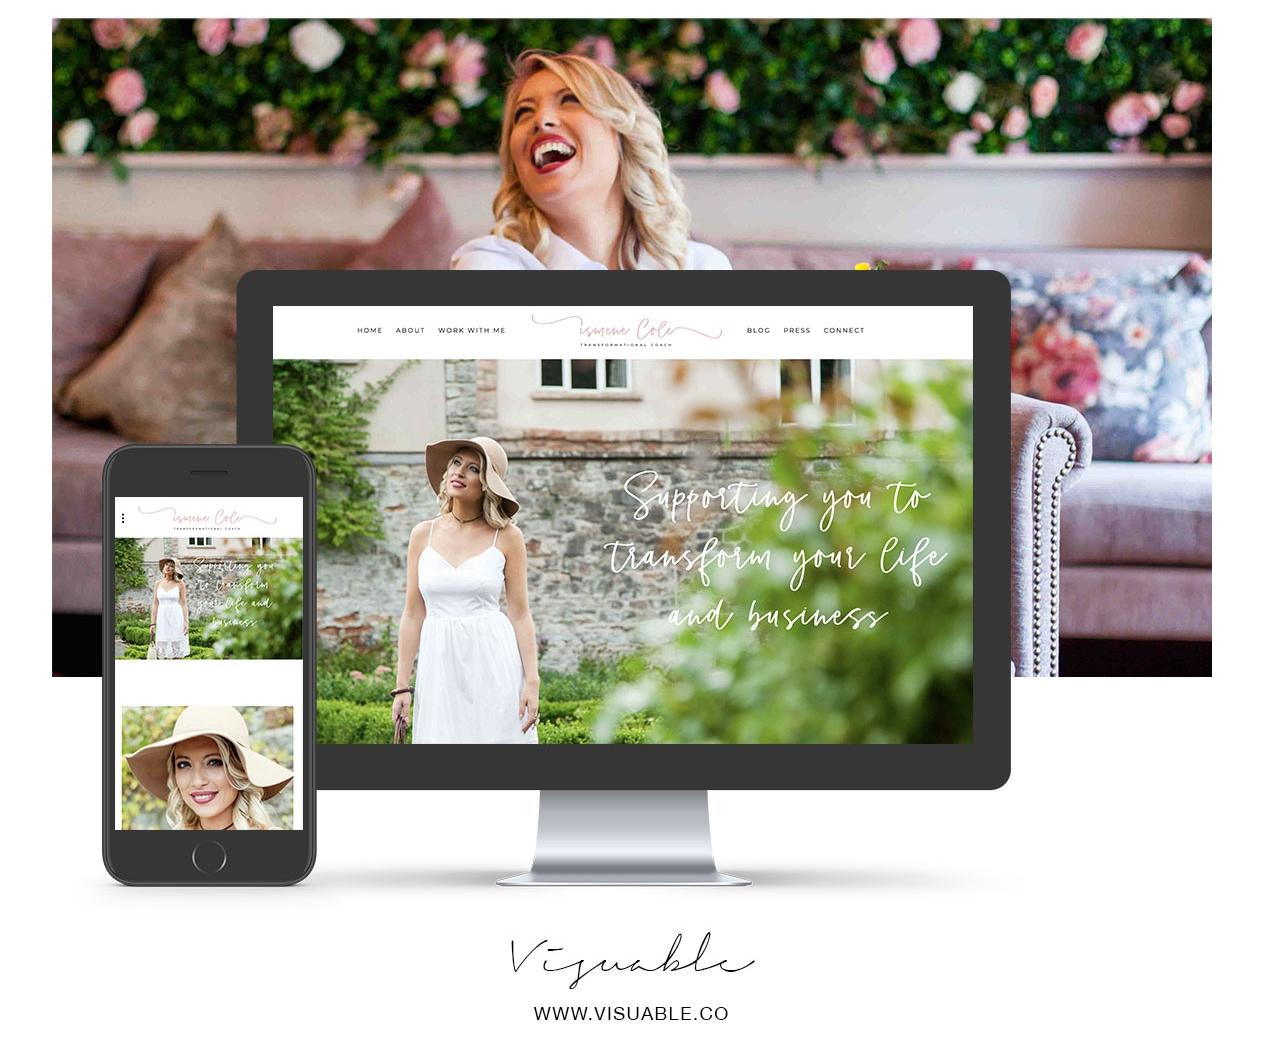 website-squarespace-design-personal-brand